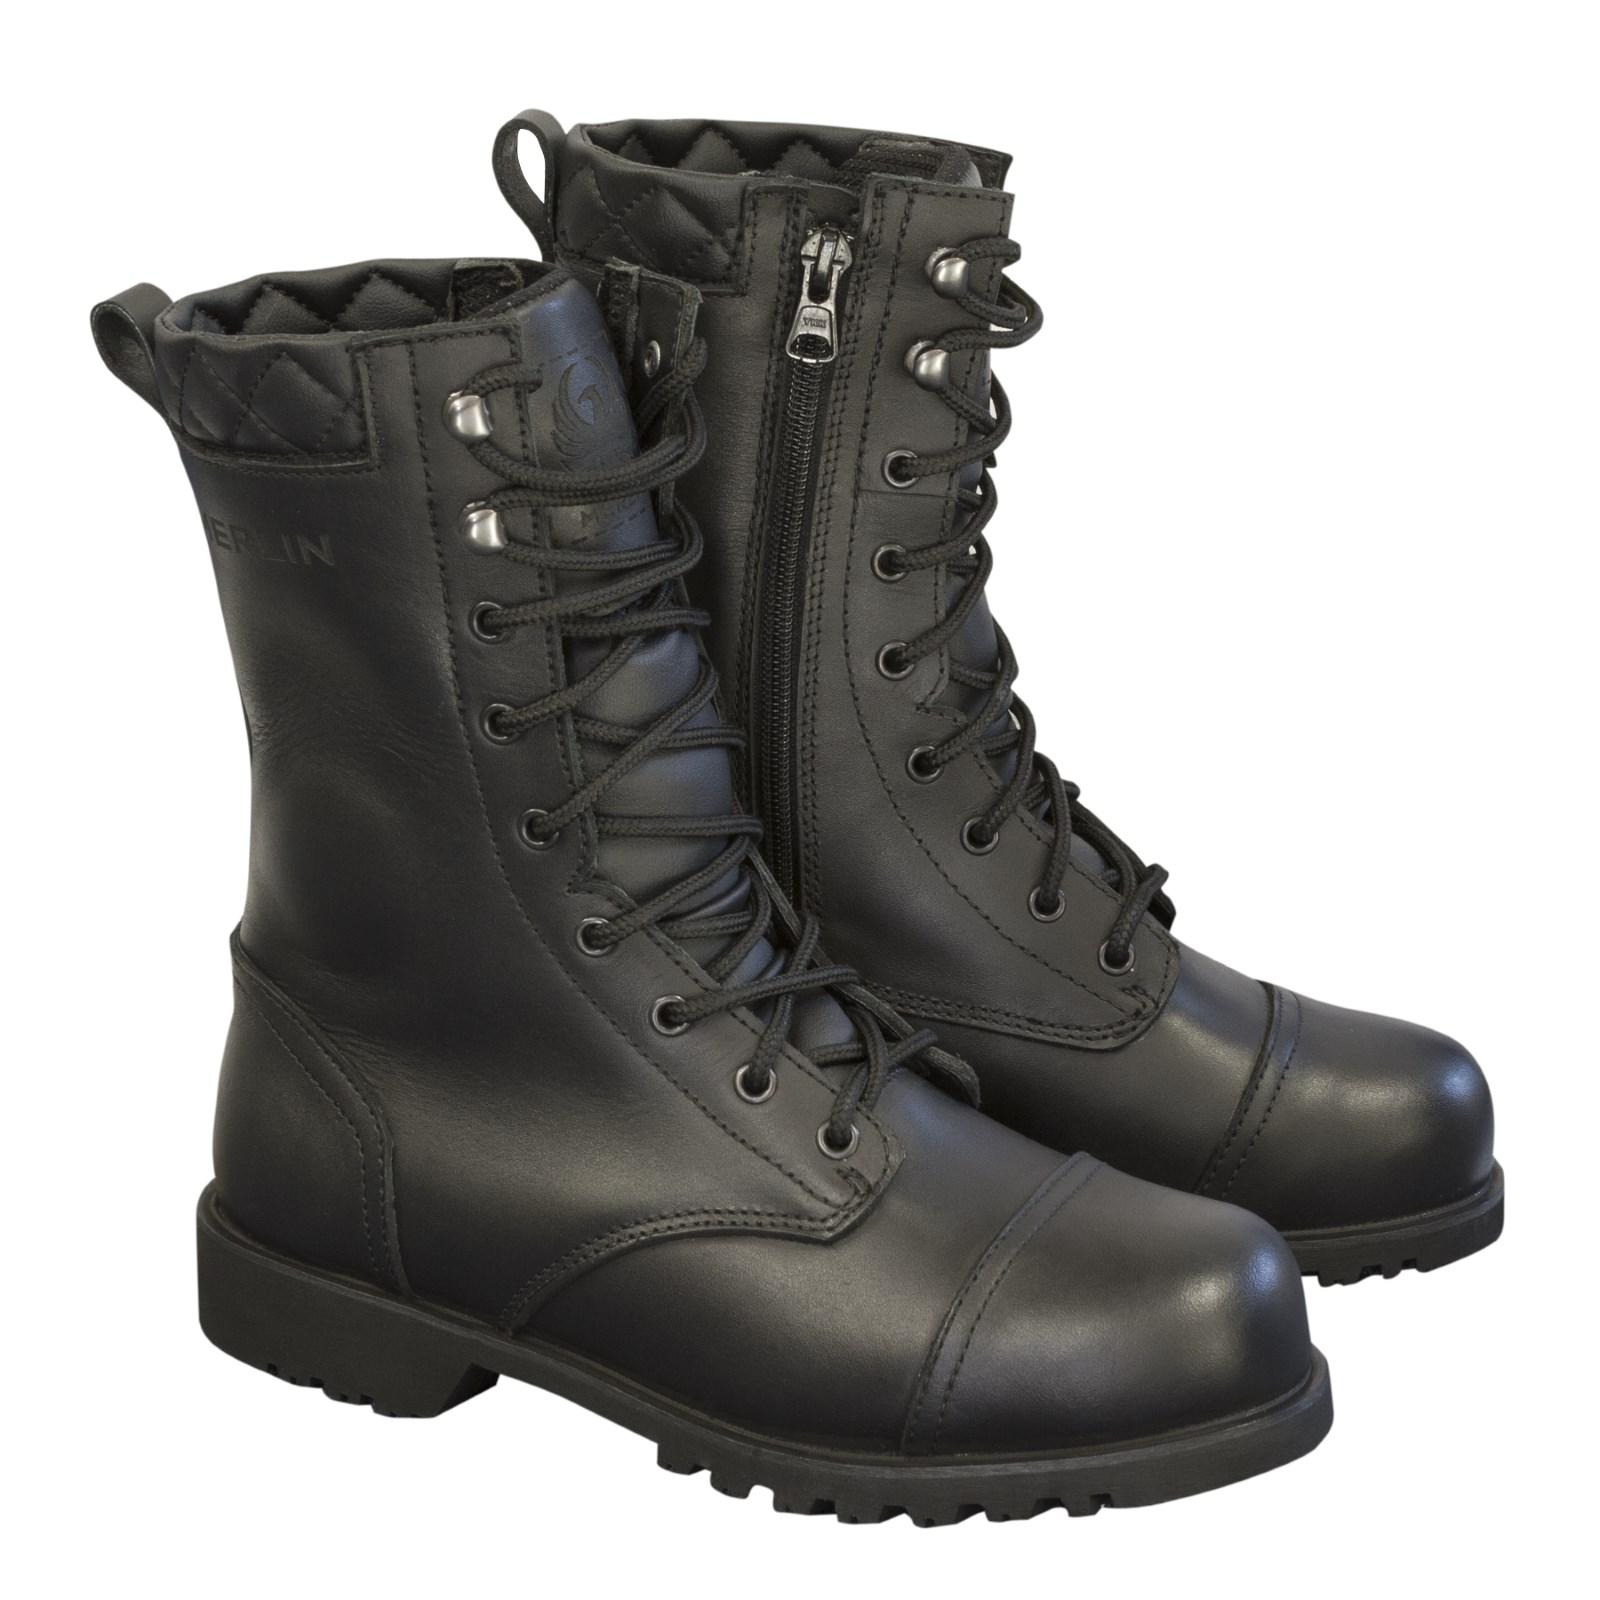 7a347cf85 Merlin G24 Ladies Combat Boots Black | M&P Direct